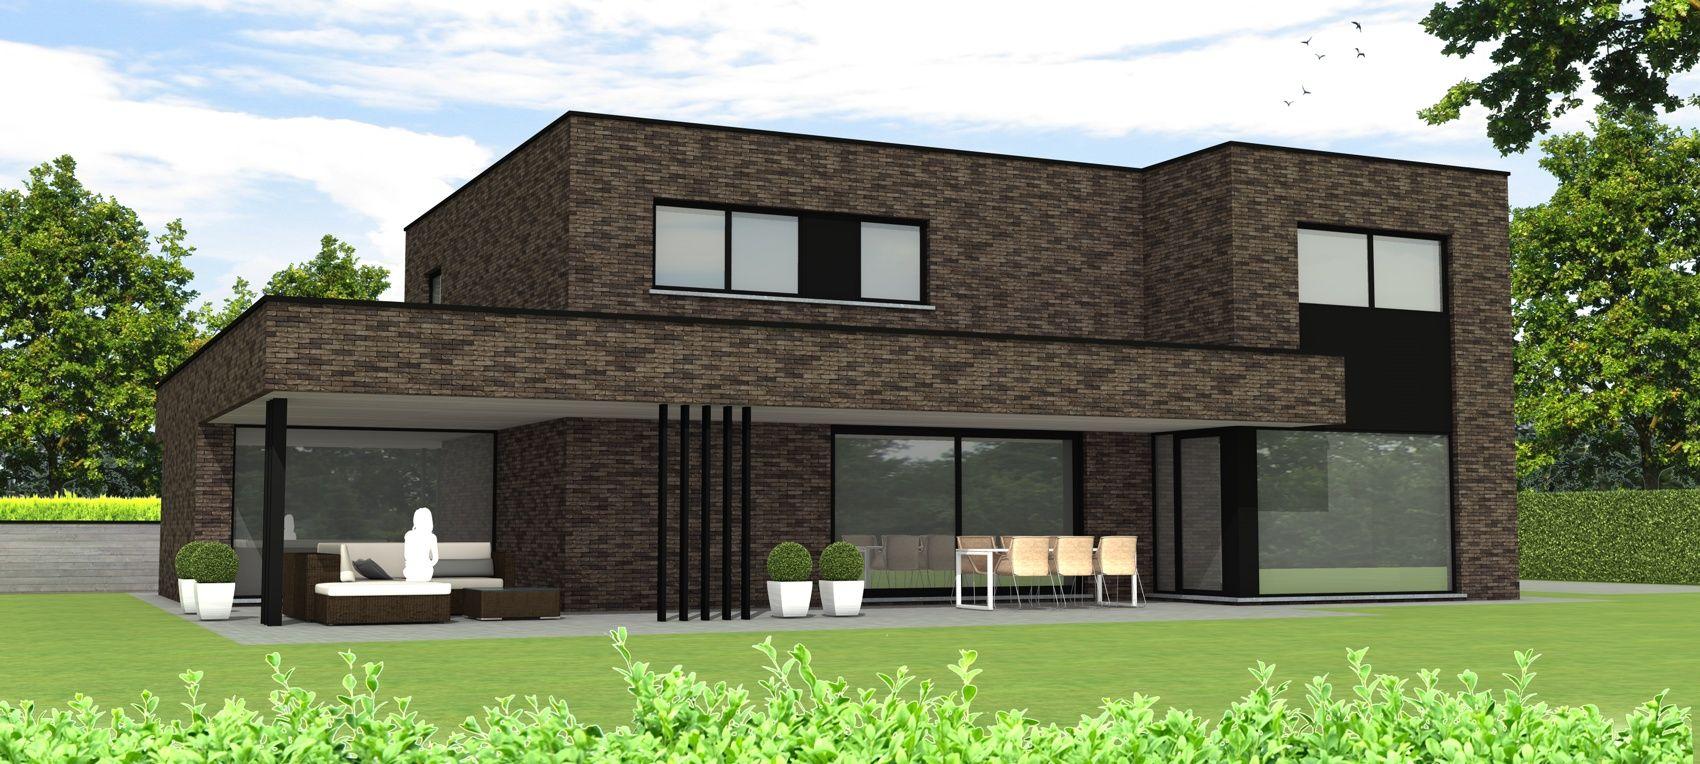 Ara architecten moderne woning moreno baksteen vandersanden maaseik overdekt terras ara - Modern overdekt terras ...